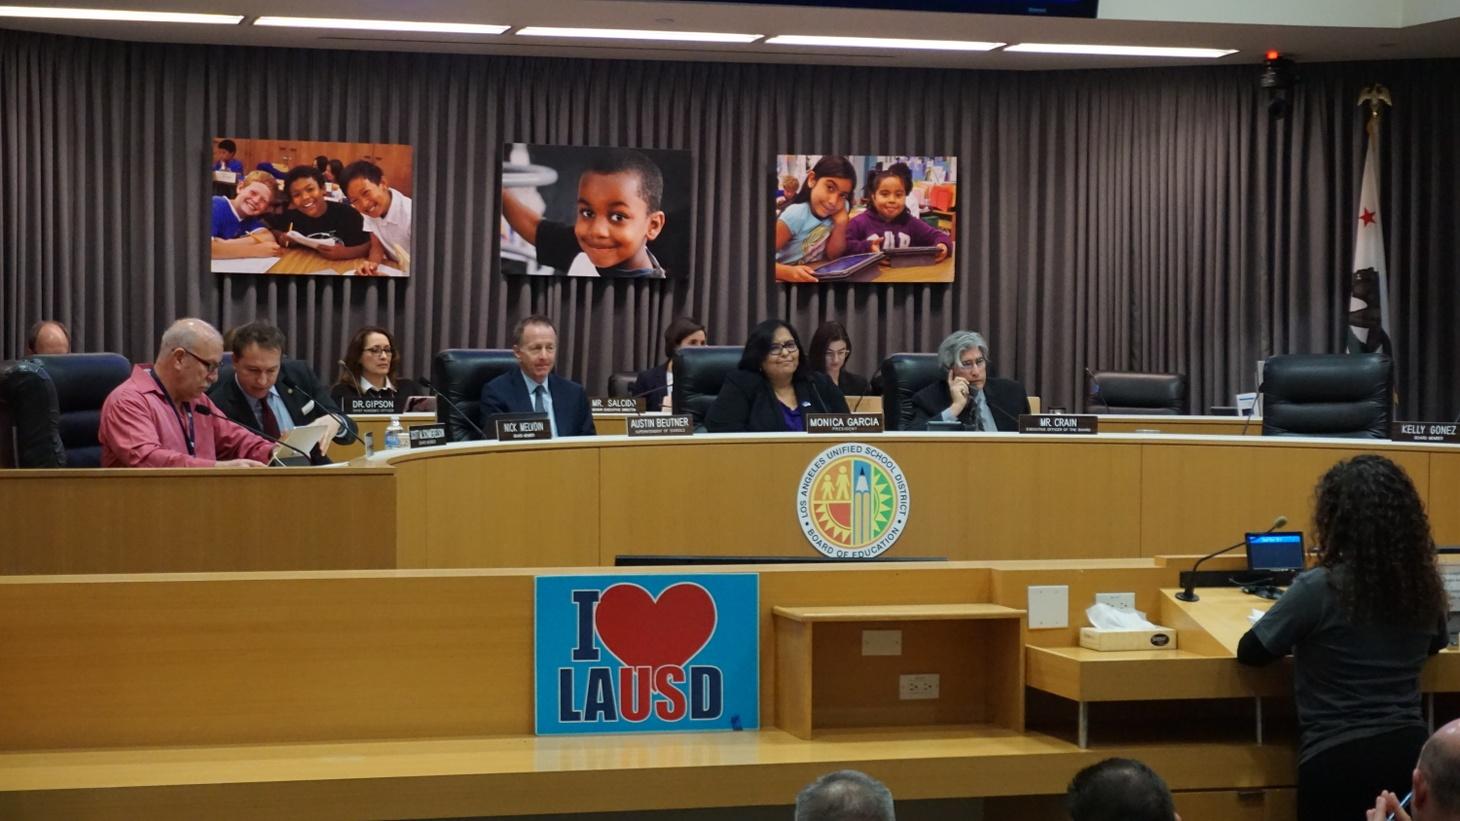 An LAUSD board meeting in December.